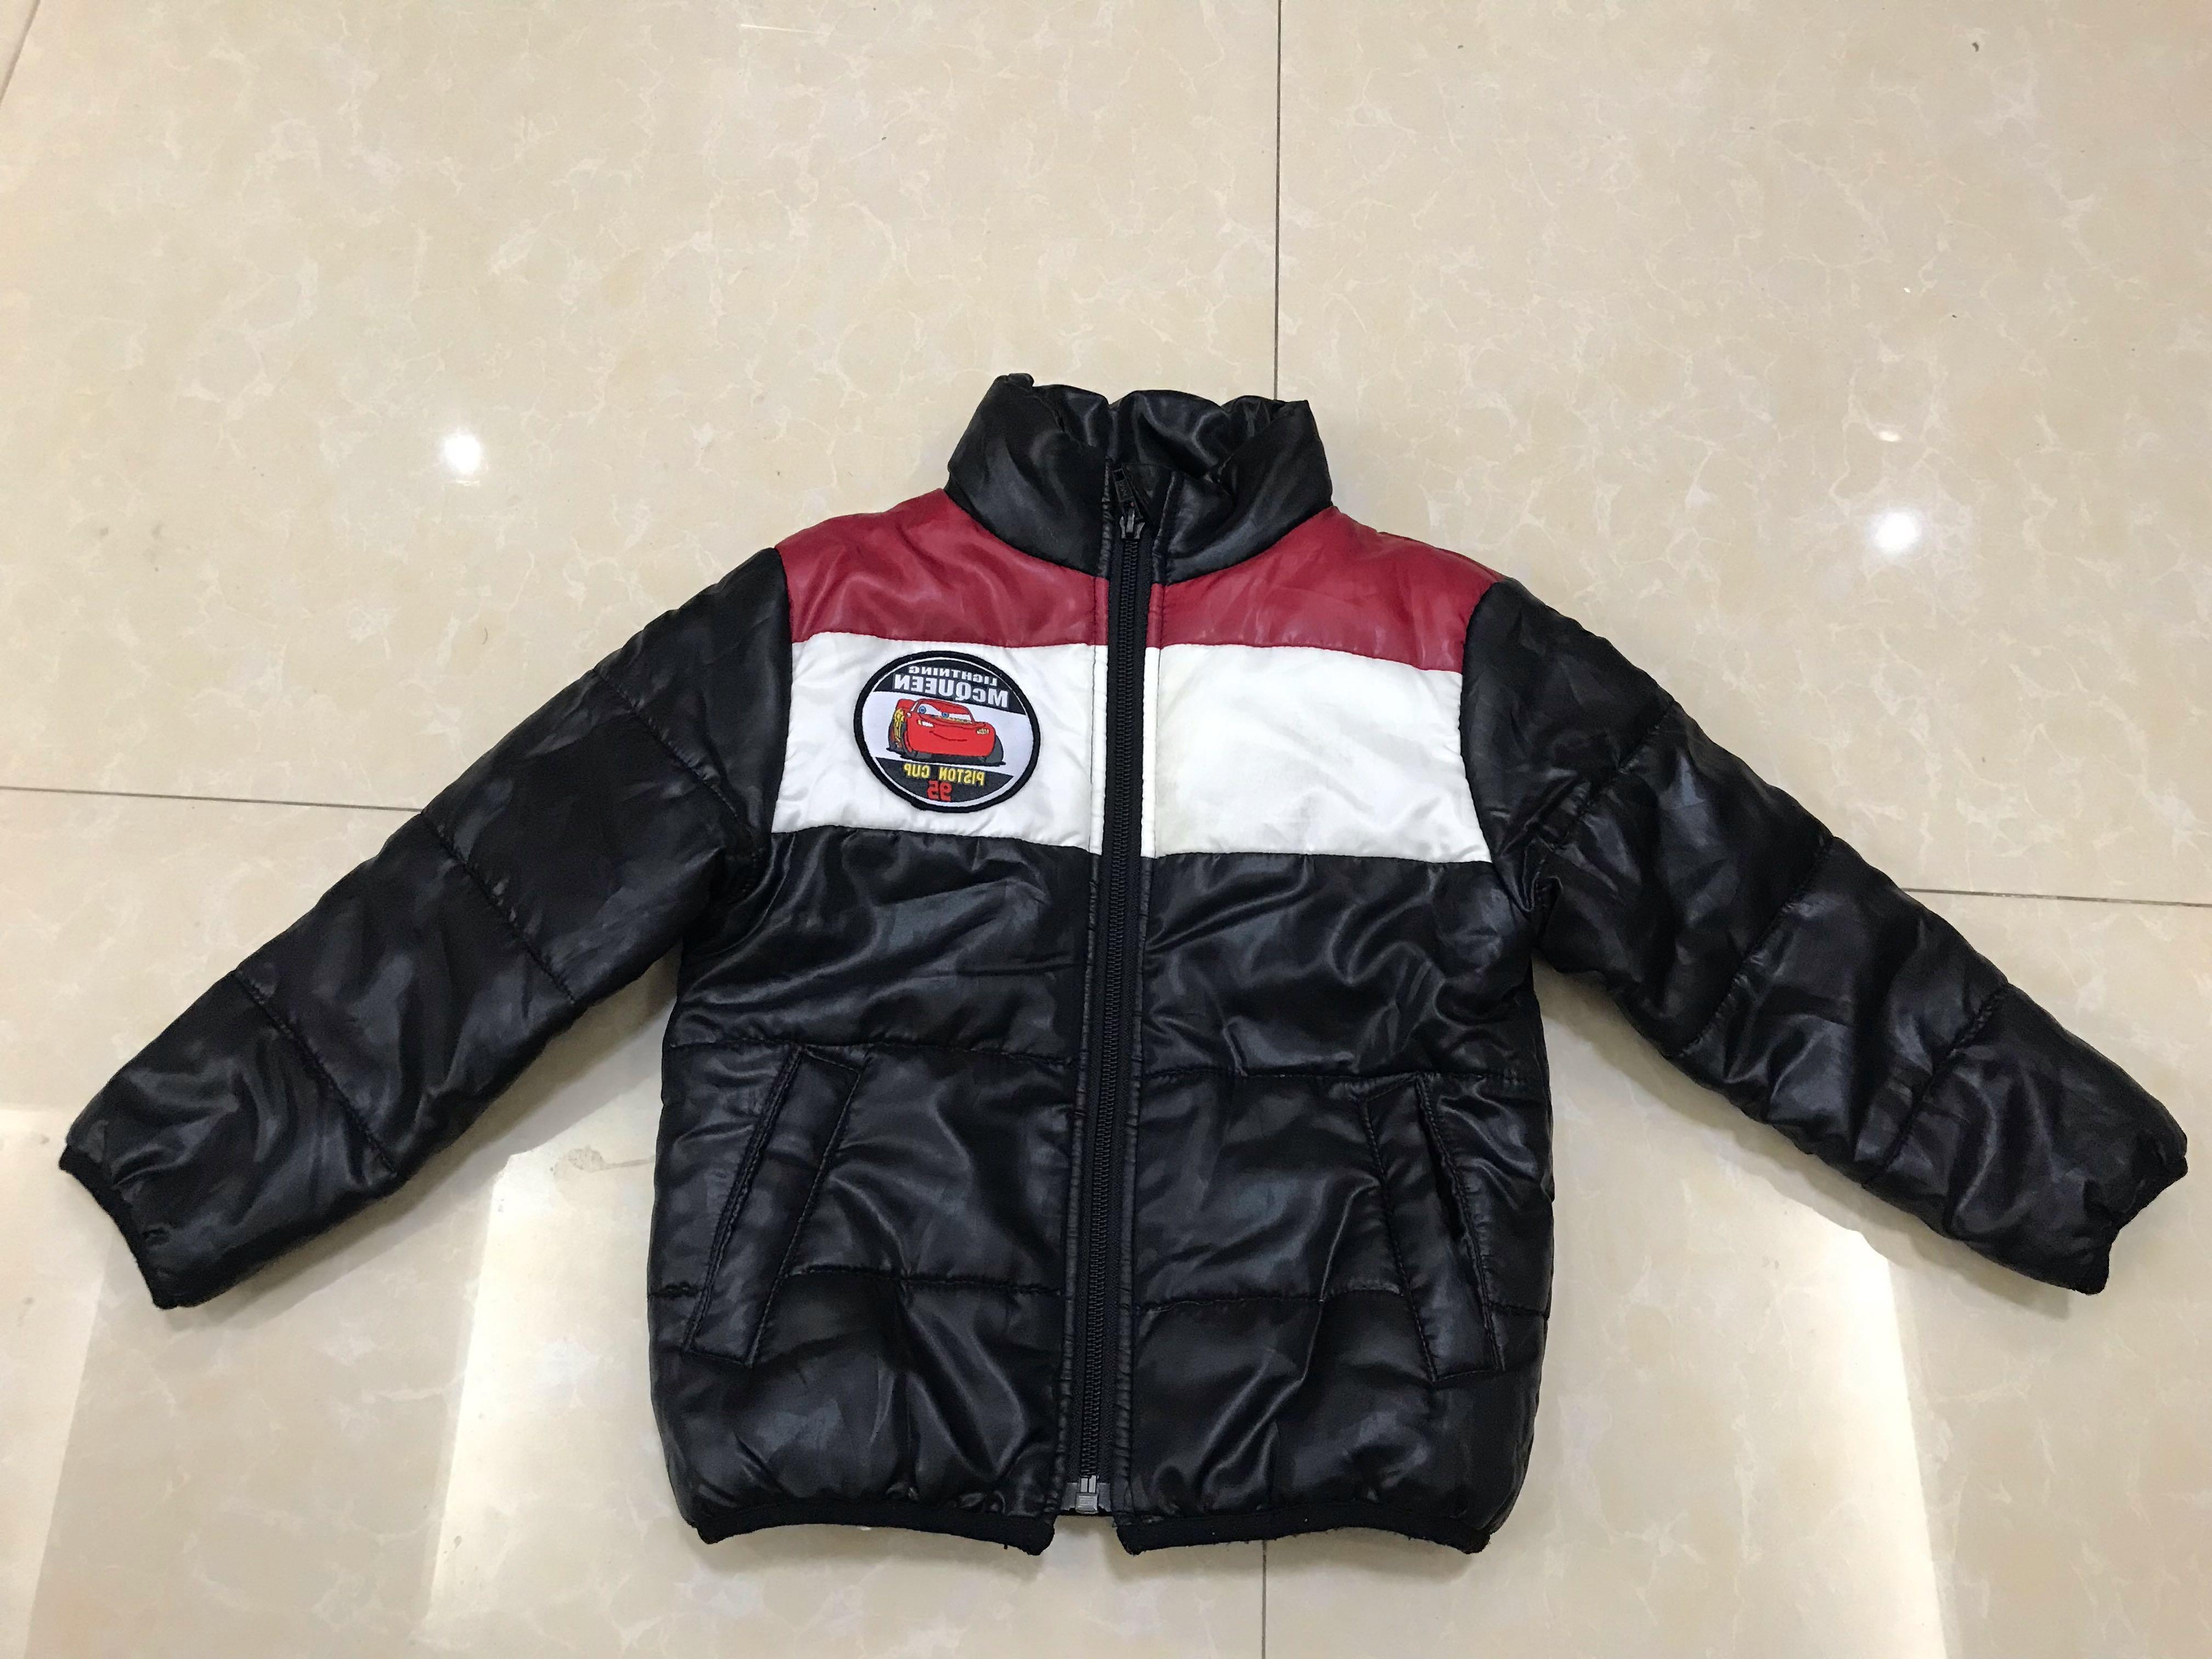 a3915cdb0 Cars winter jacket for kids